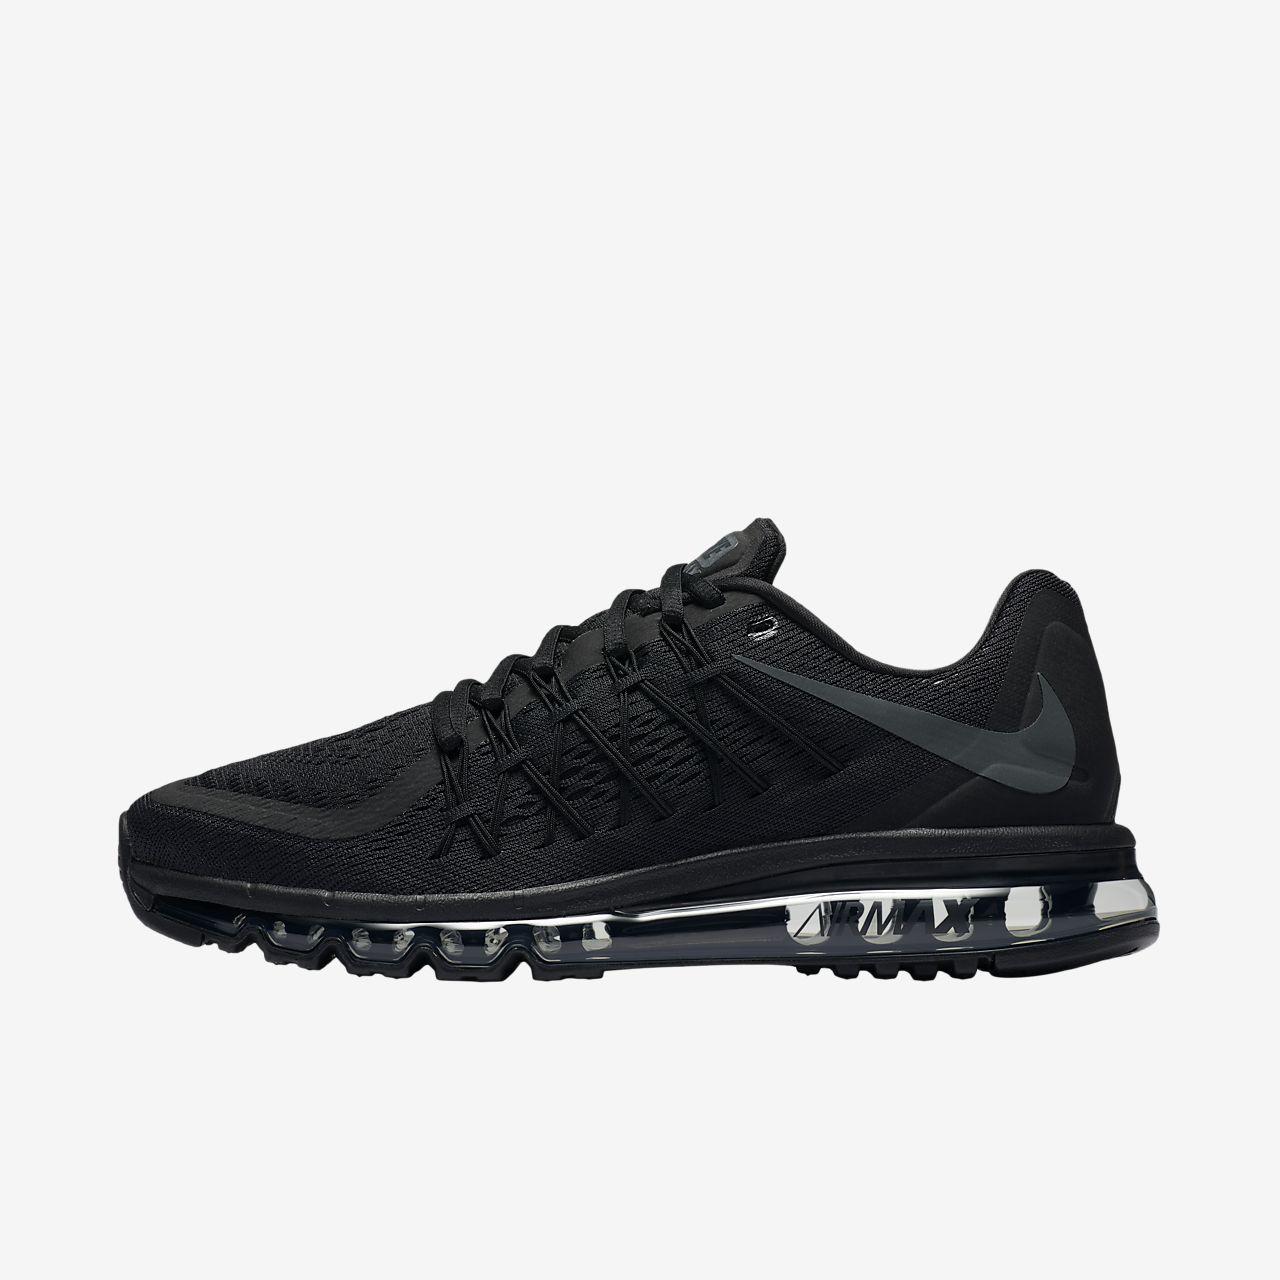 sneakers for cheap e05e6 1acfd Nike Air Max 2015 Zapatillas - Hombre. Nike.com ES